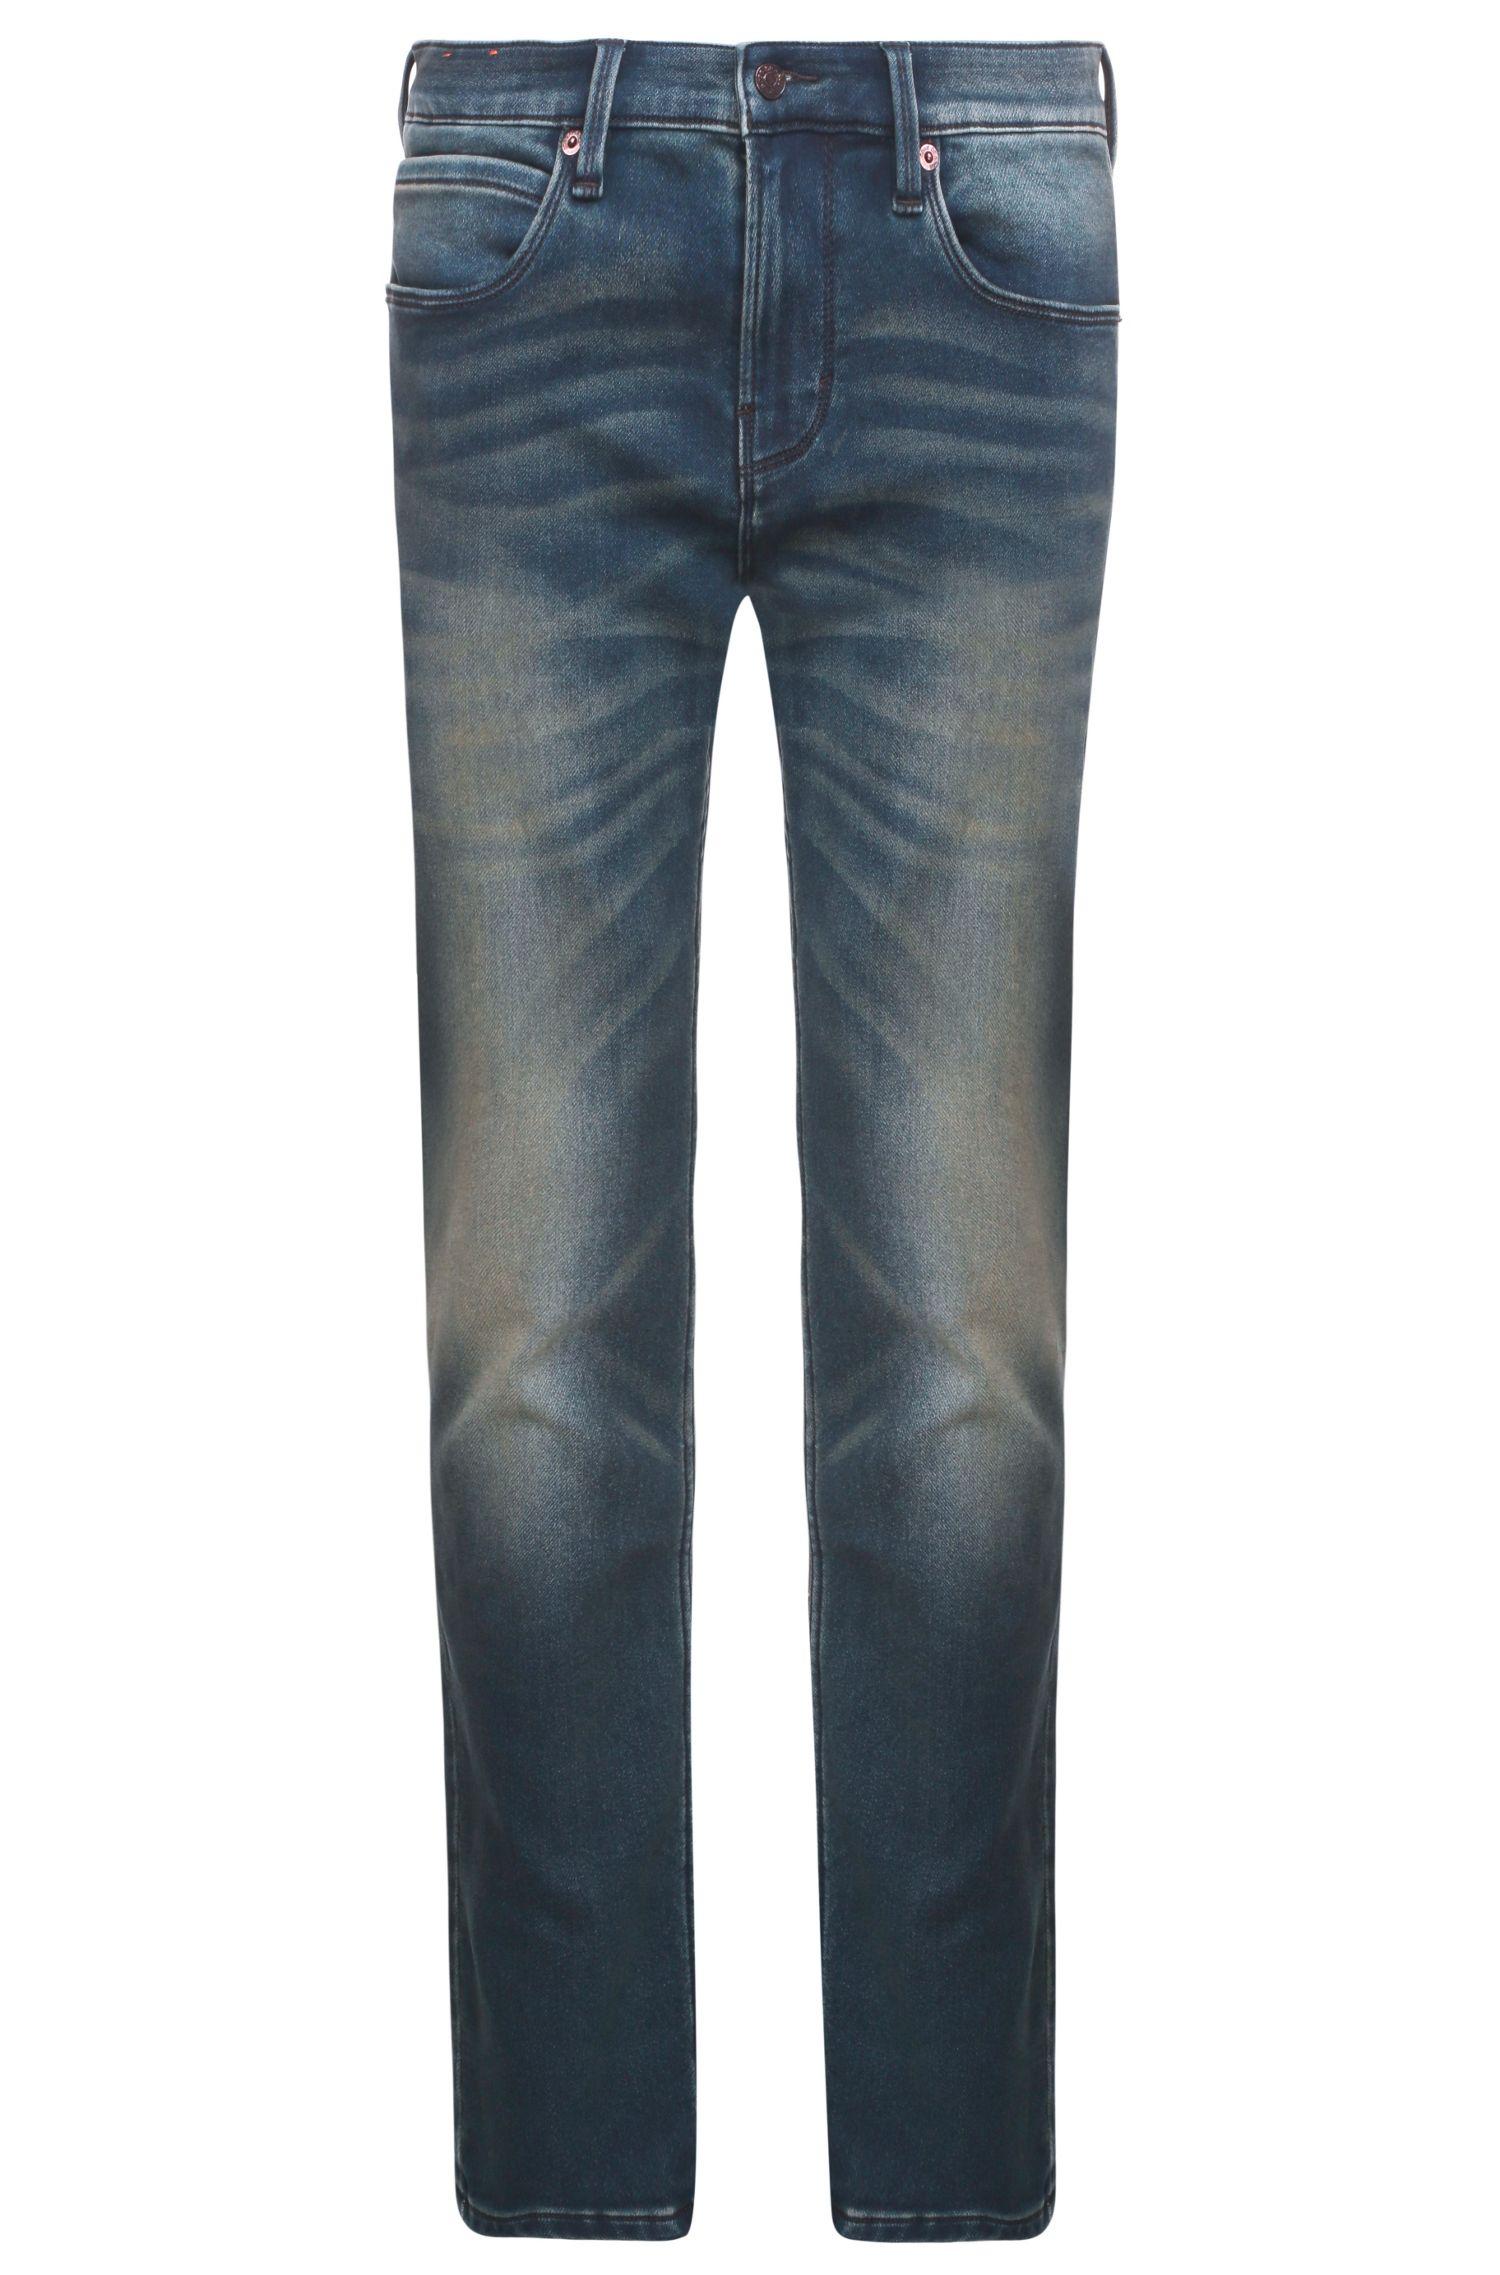 'Orange63 London' | Slim Fit, 9.5 oz Stretch Cotton Blend Jeans